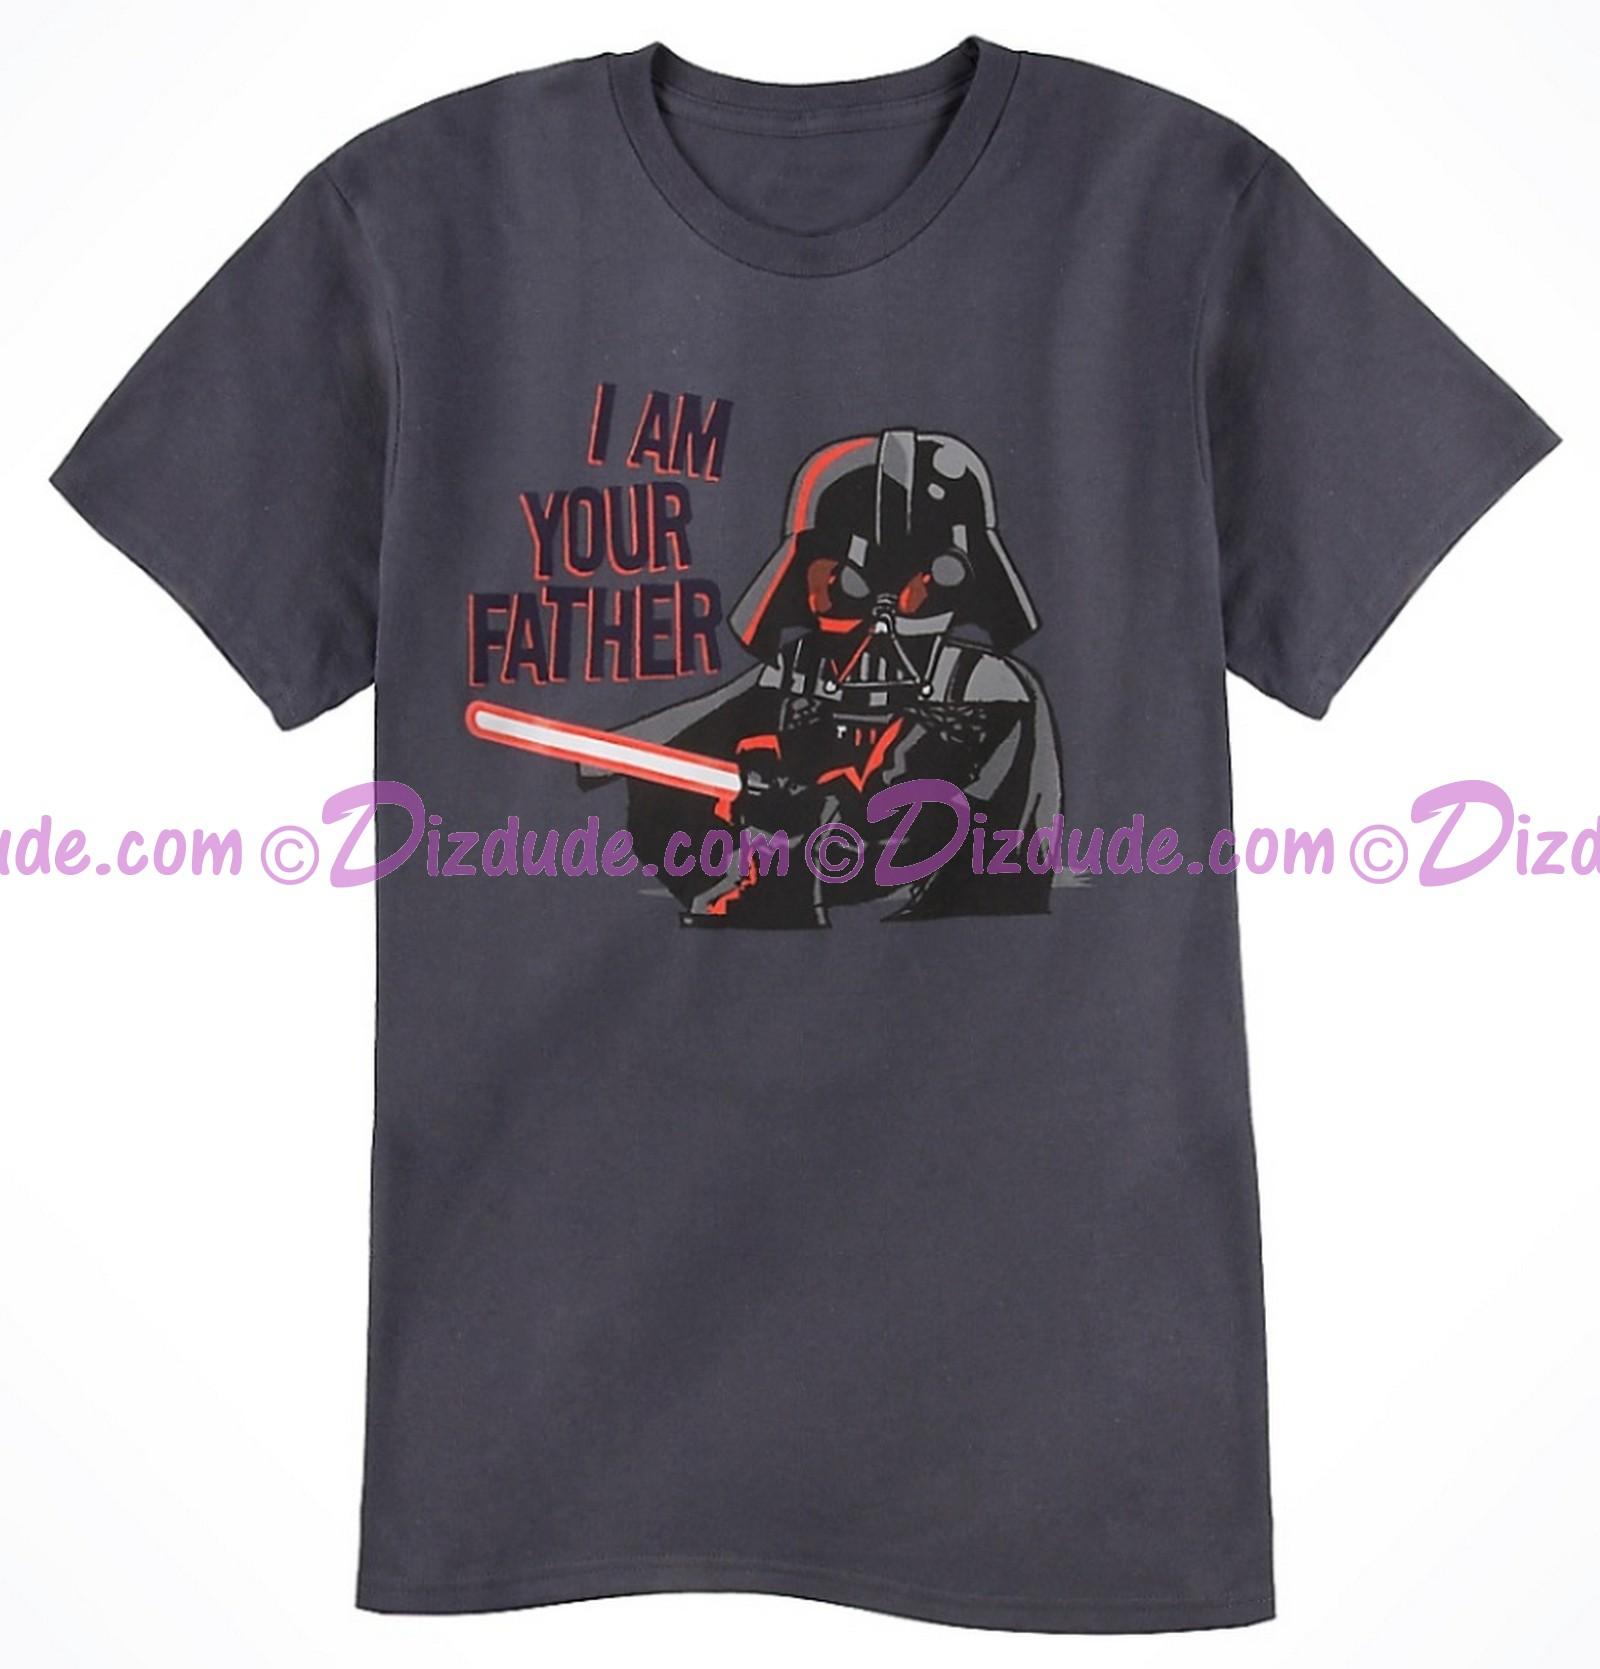 Vintage Star Wars Darth Vader I Am Your Father Adult T-Shirt (Tshirt, T shirt or Tee) © Dizdude.com